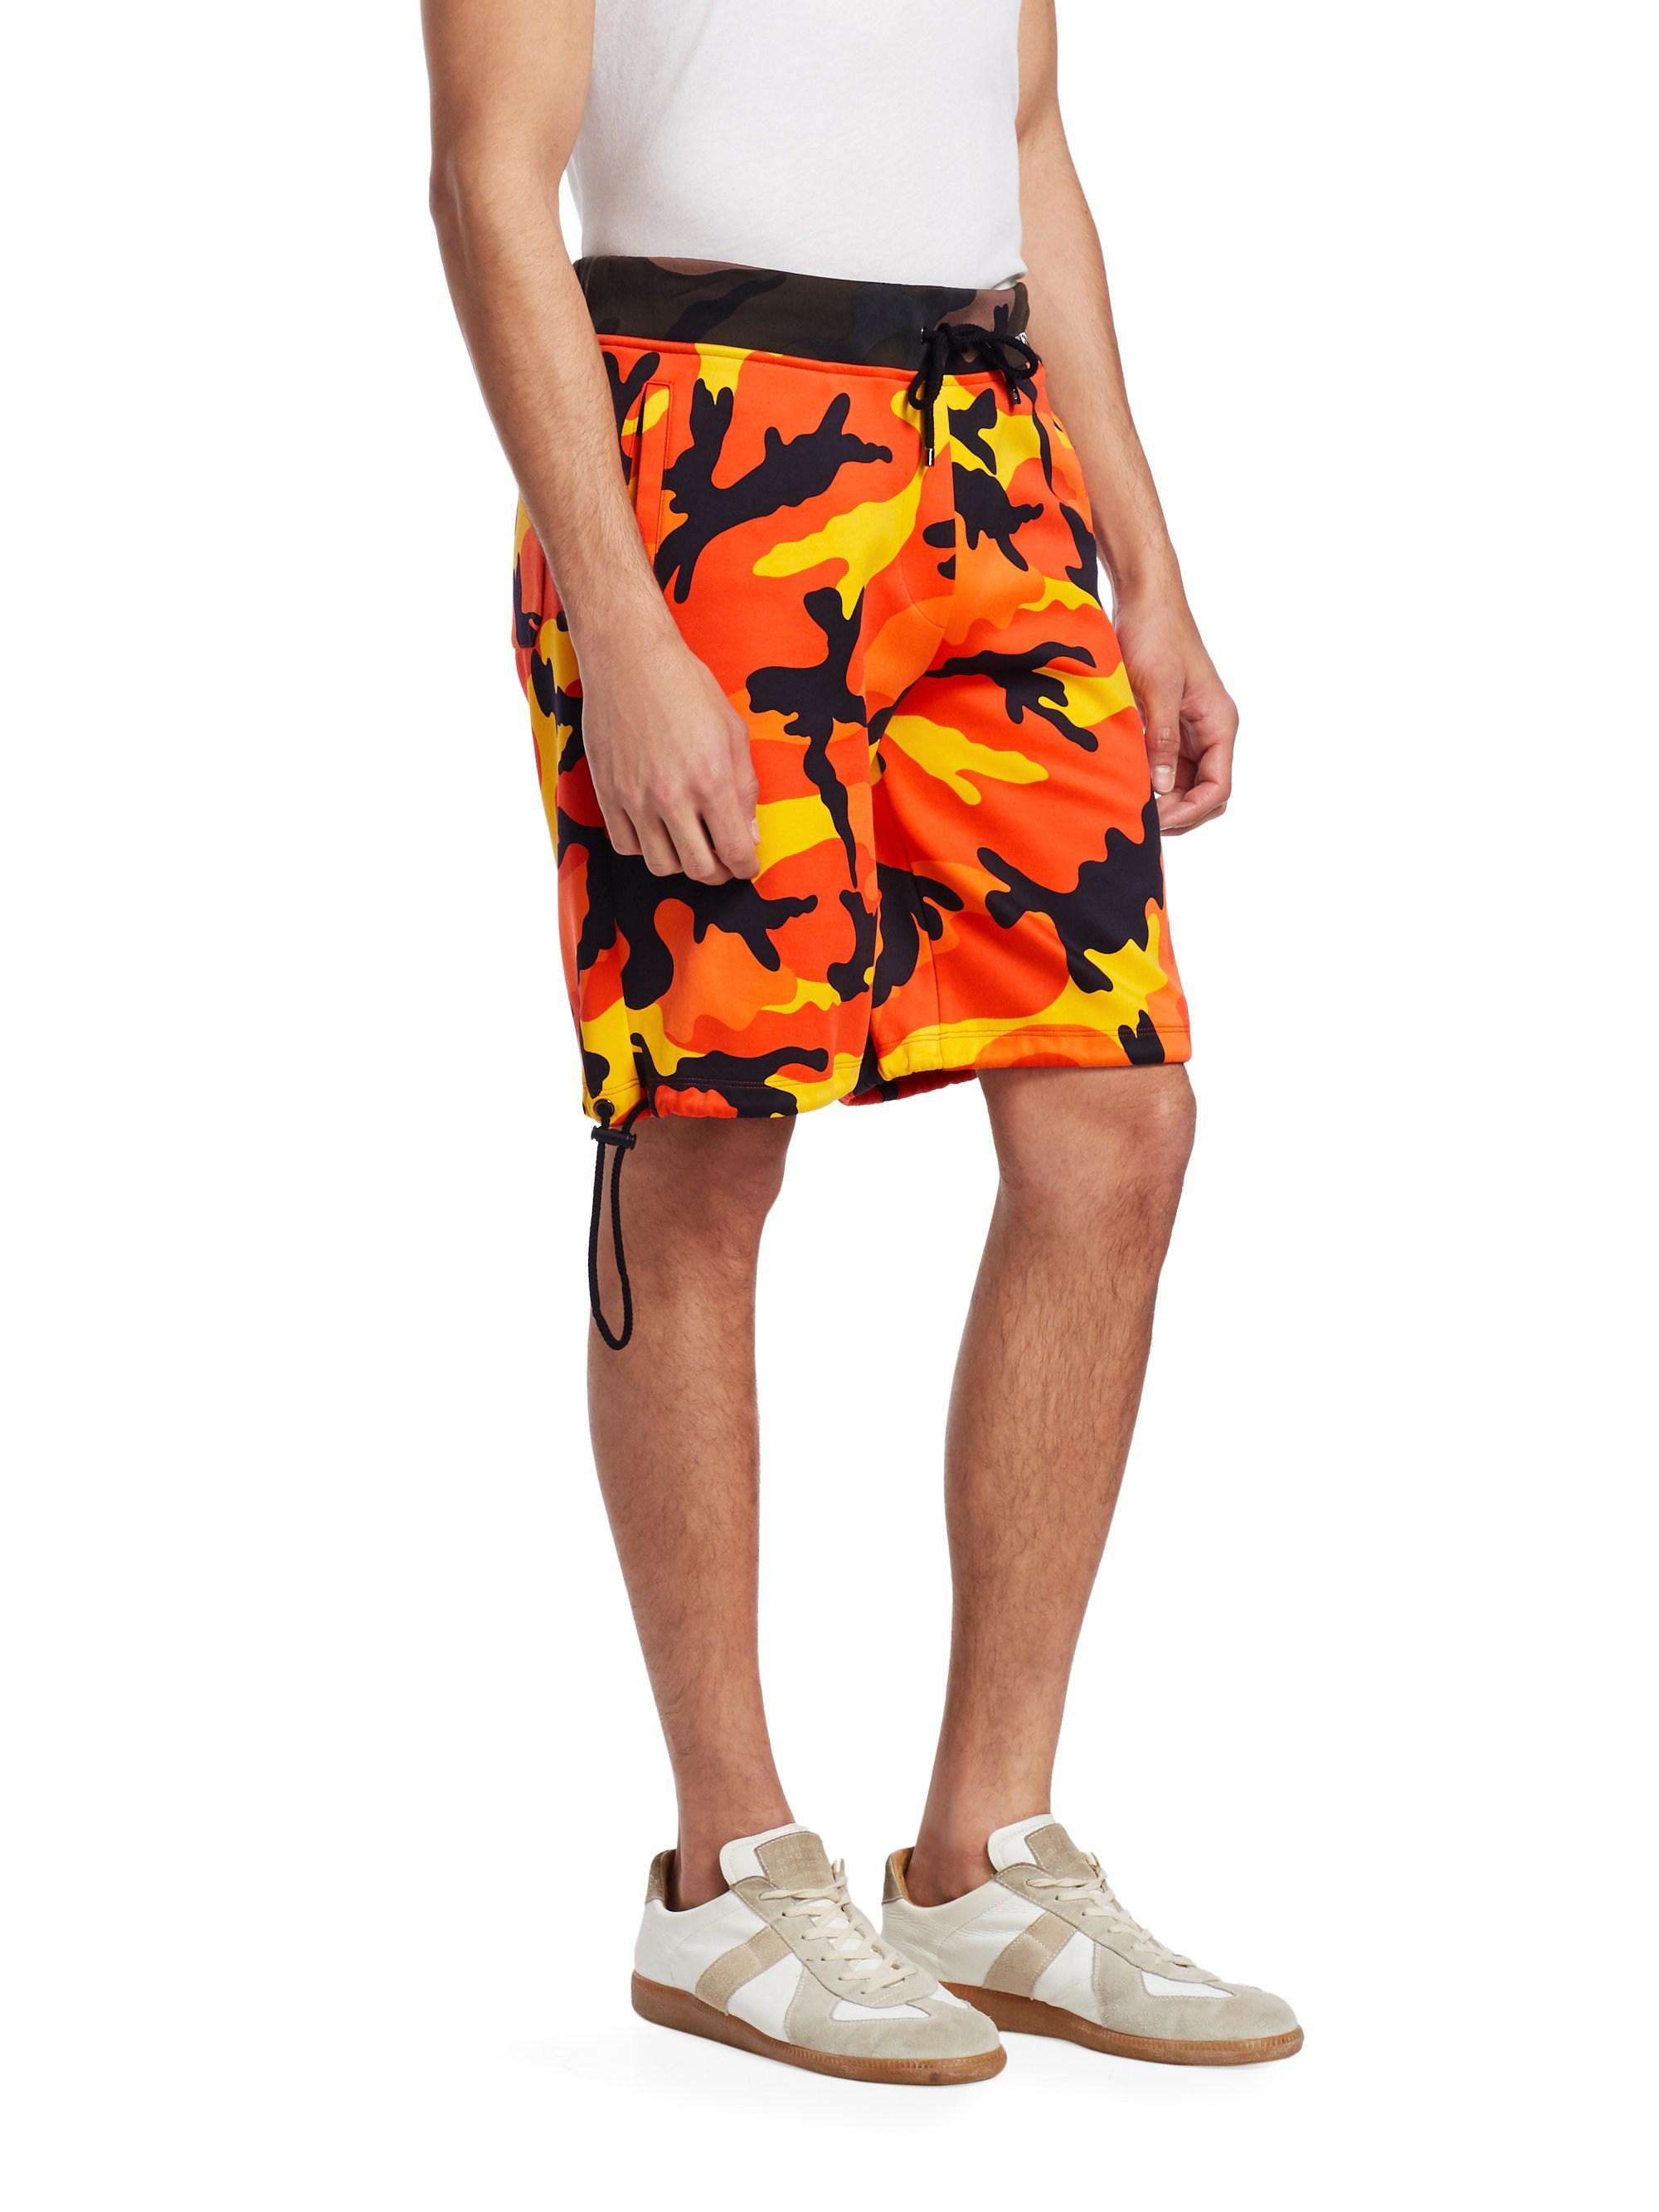 Lyst - Valentino Men s Camouflage Classic Shorts - Orange Camo ... 12bc4cafd6b